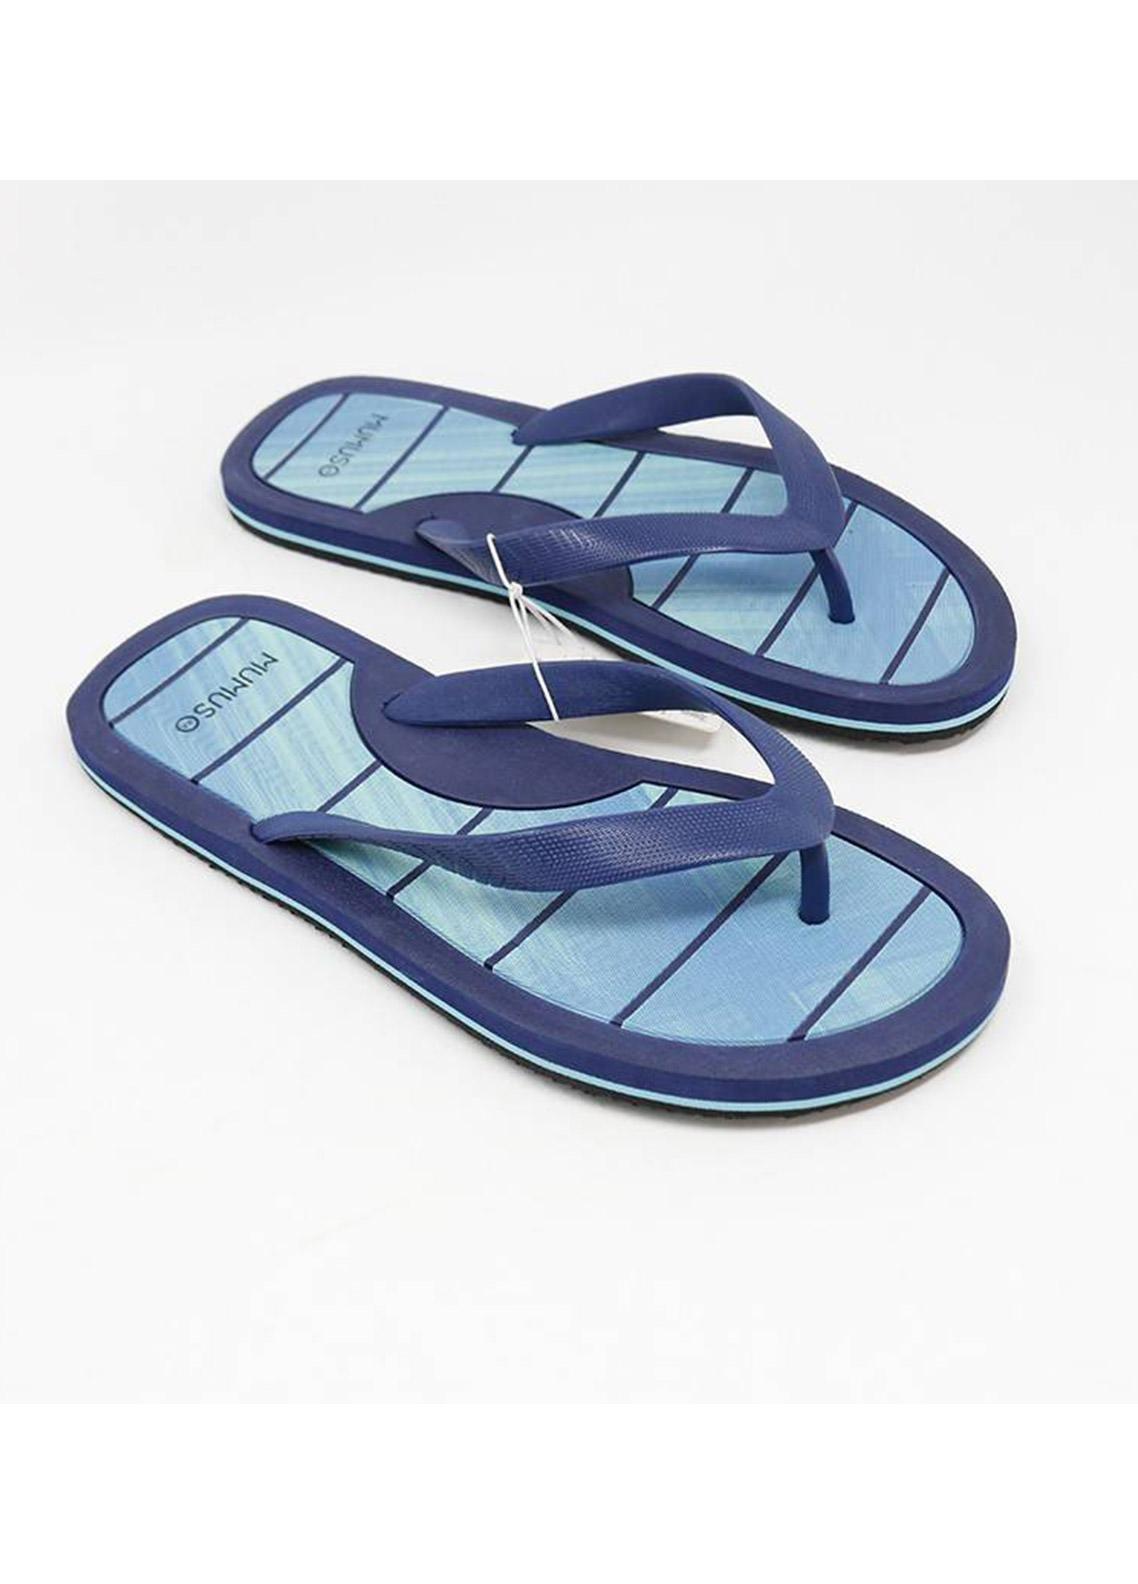 Mumuso Casual Style  Flat Flip Flop MEN-D-Blue